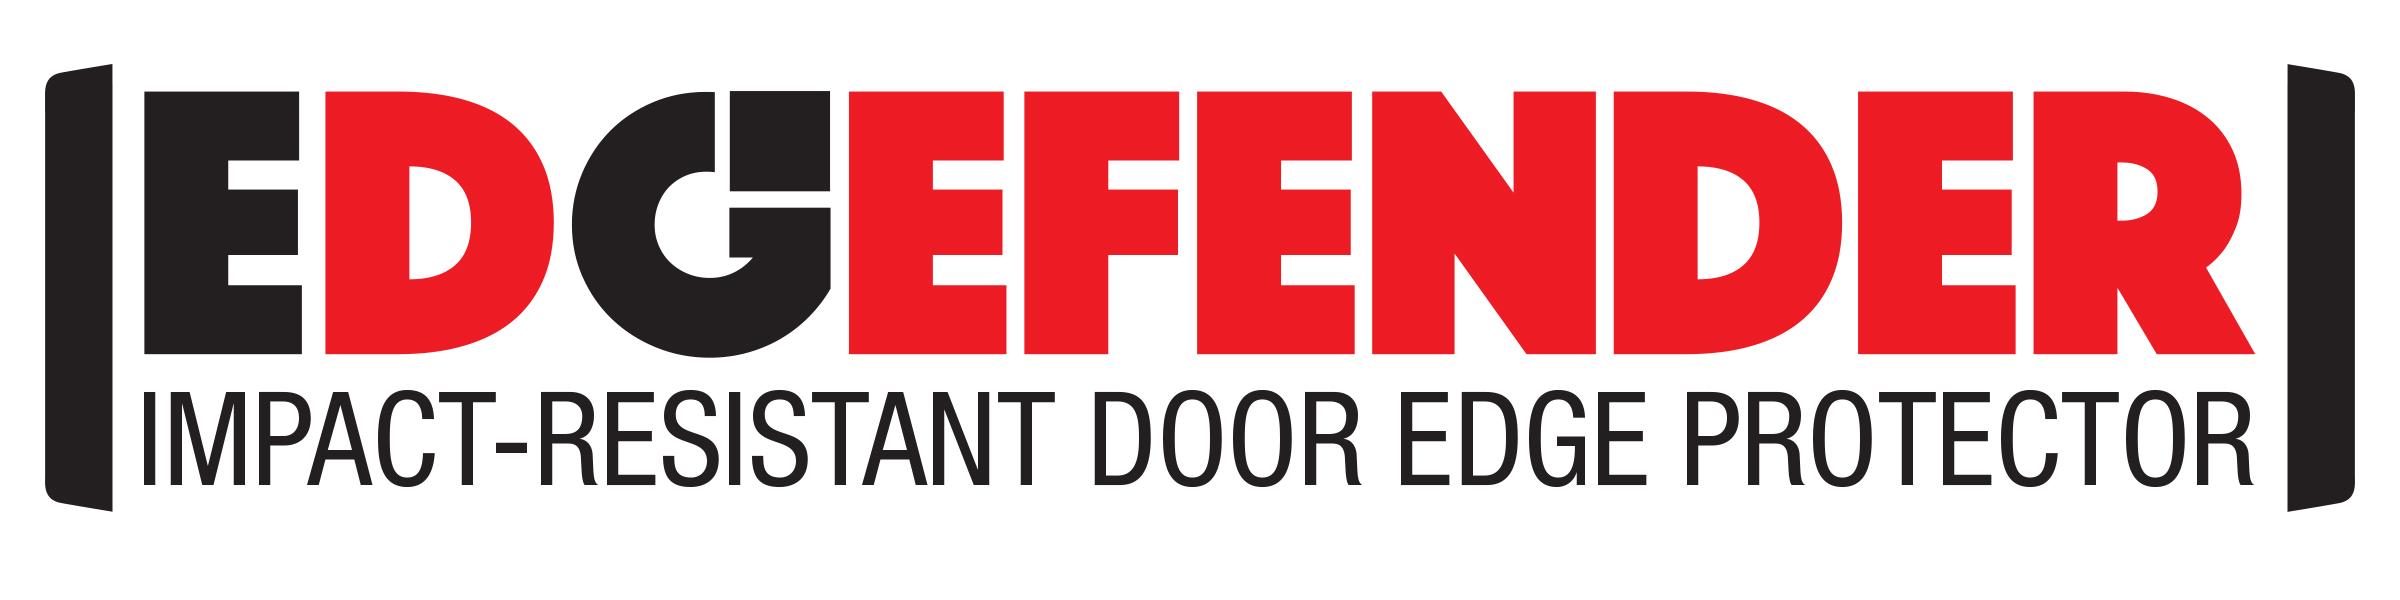 LAMBTON DOORS Edgefender Logo